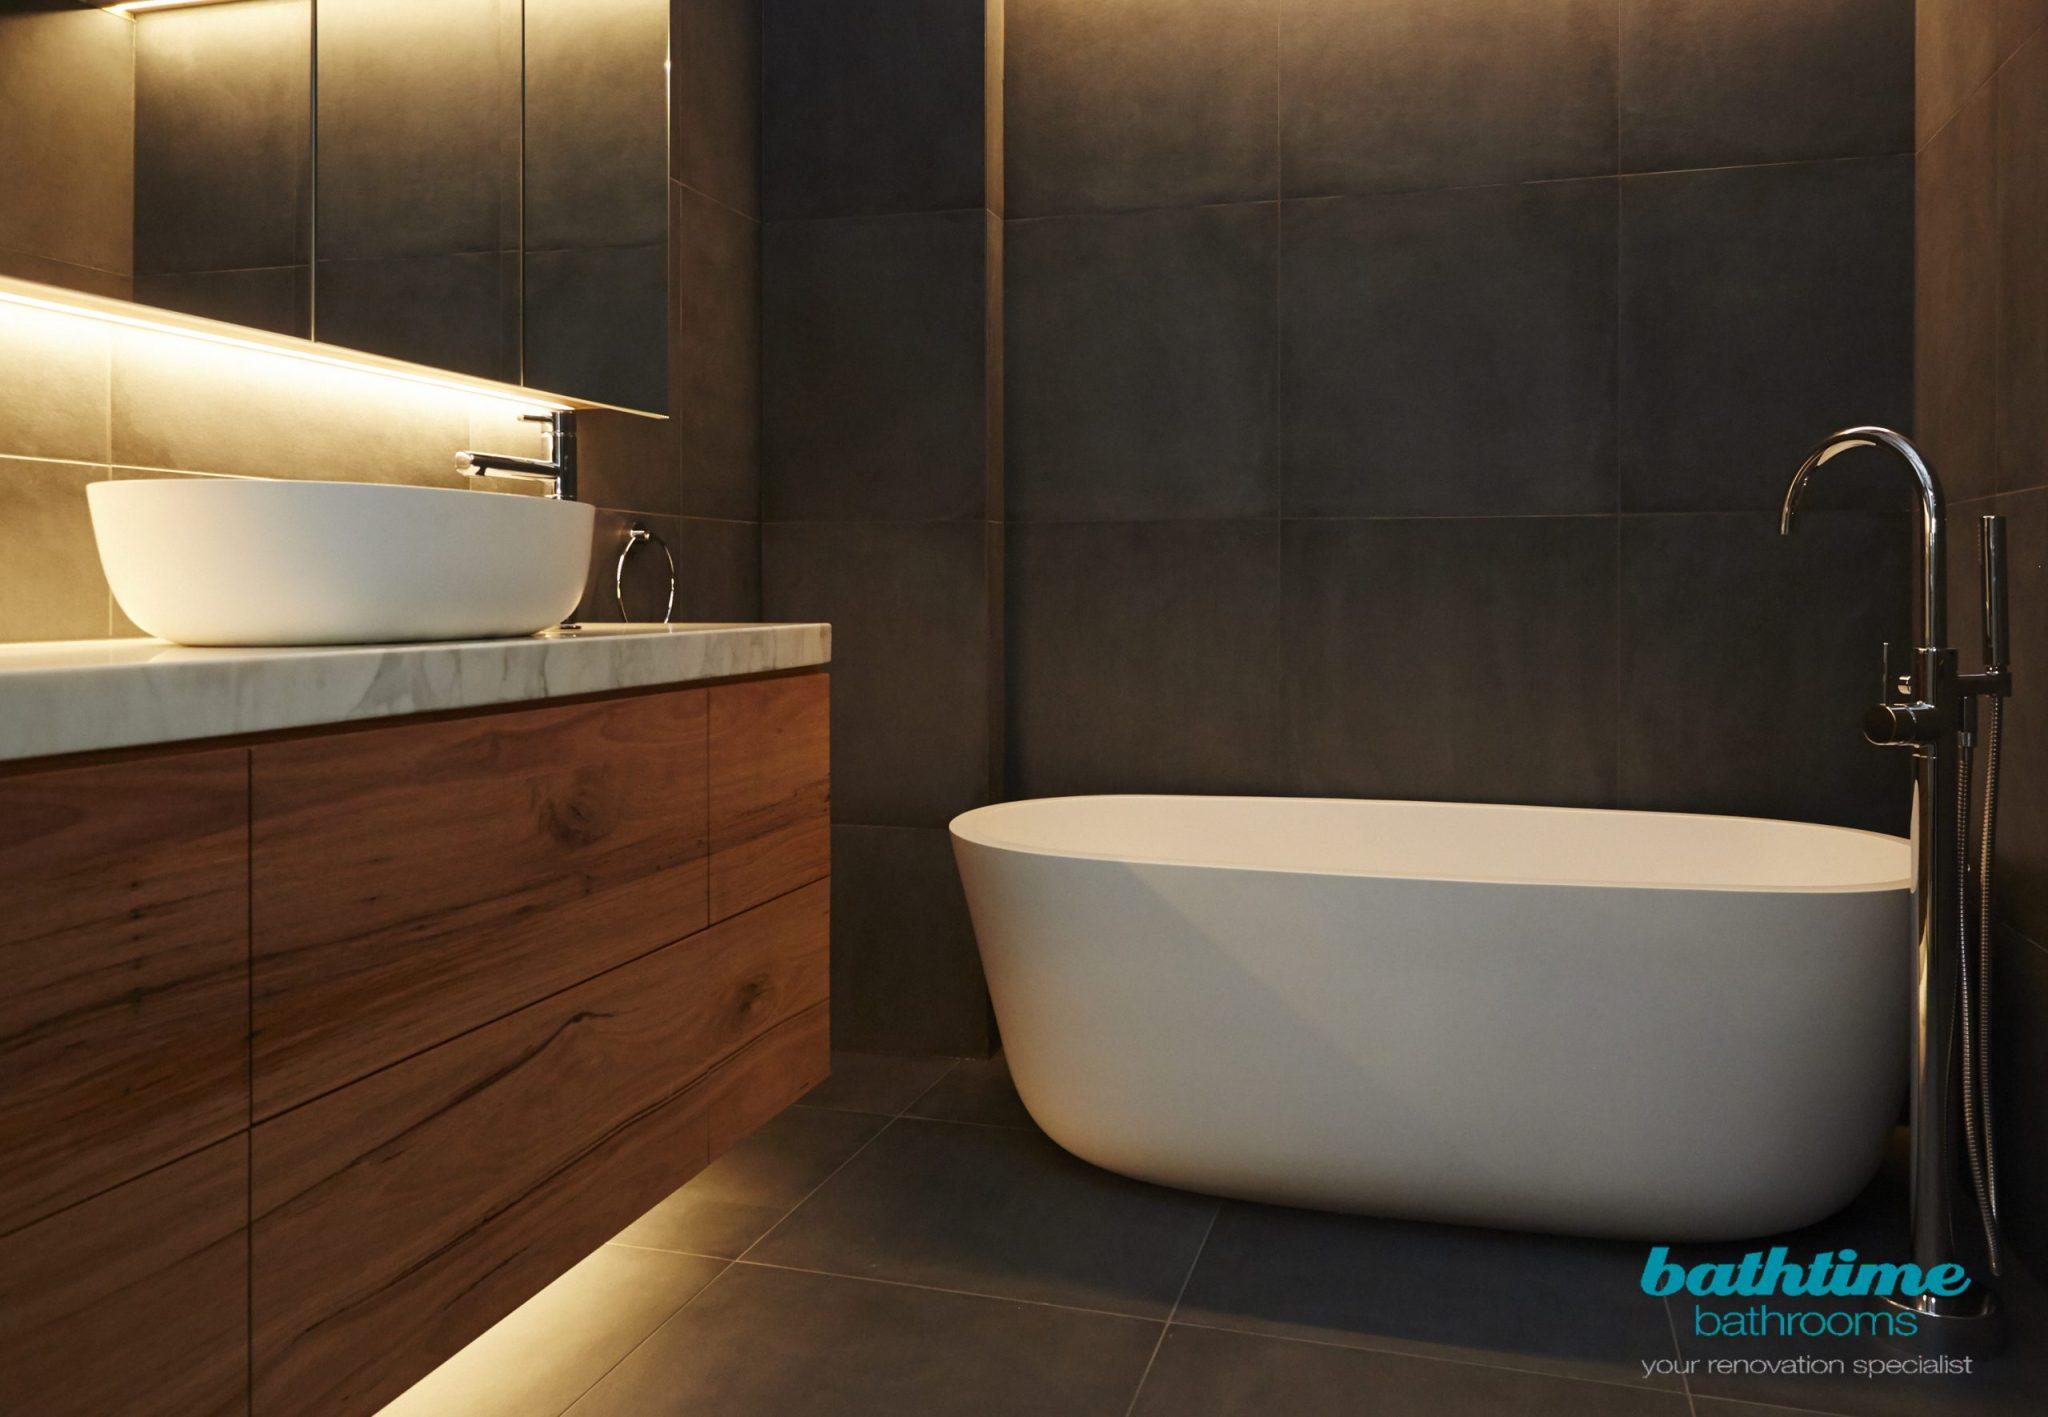 Bathtime Bathrooms